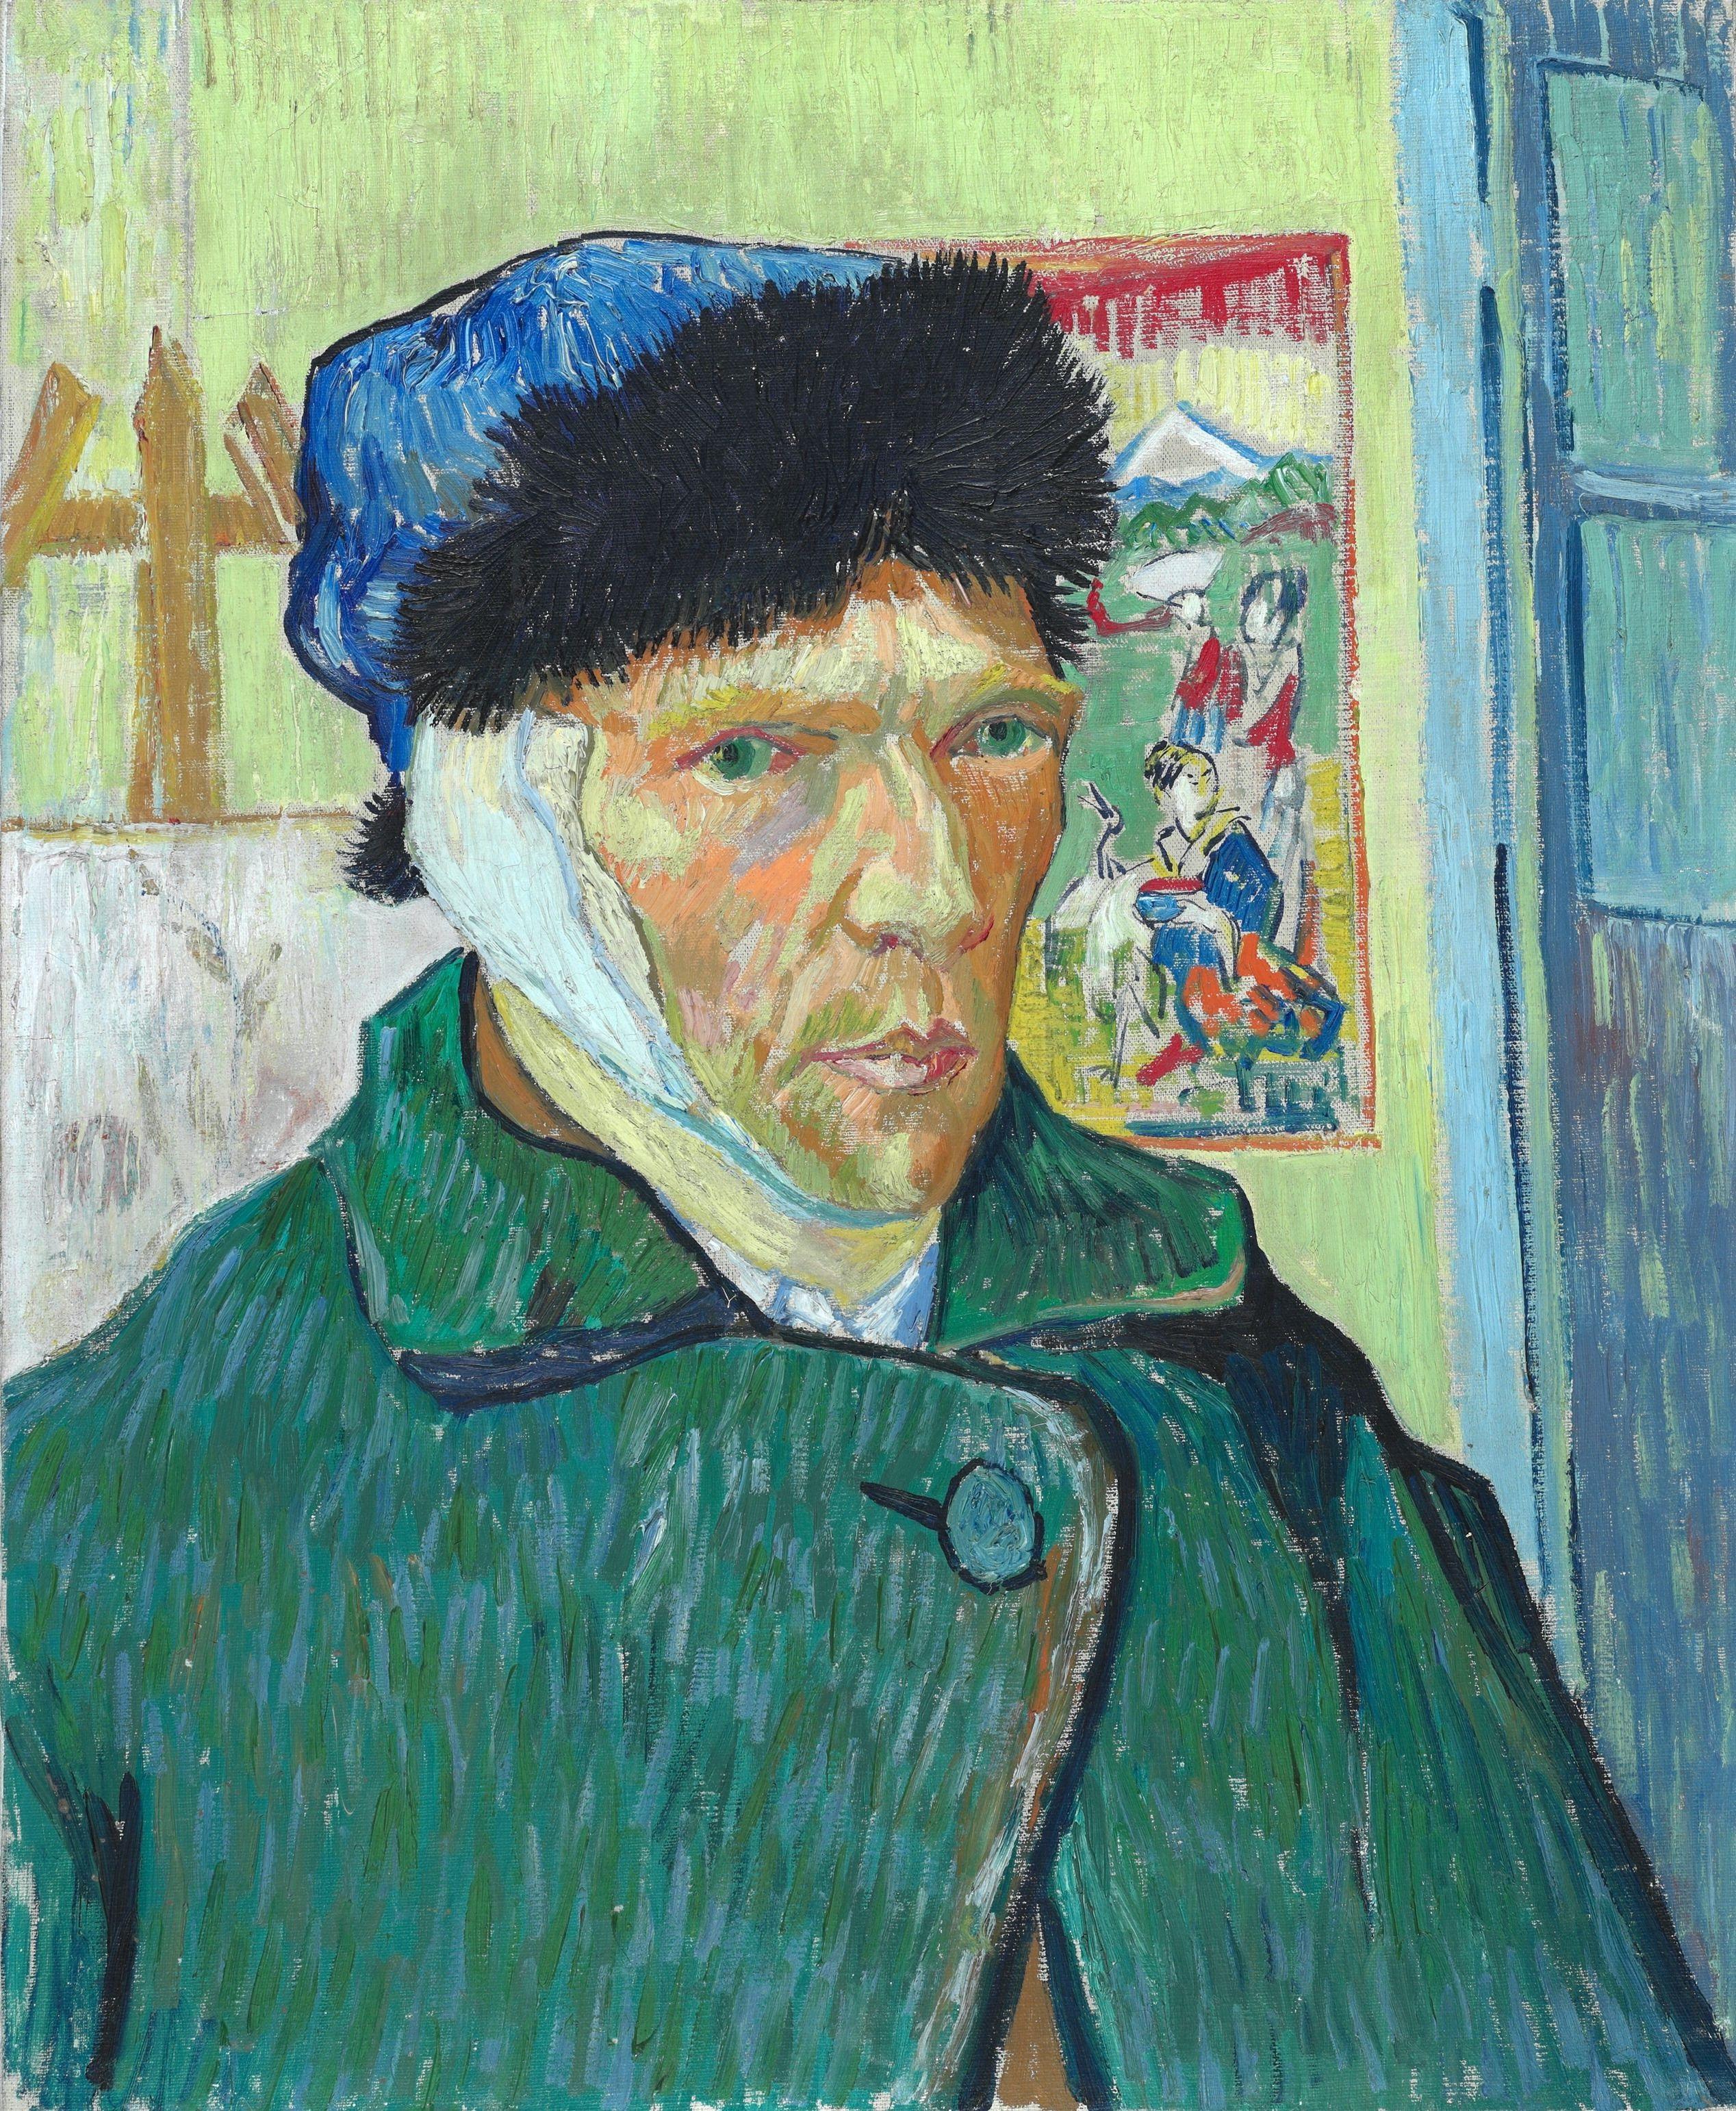 Self-Portrait with Bandaged Ear - Wikipedia